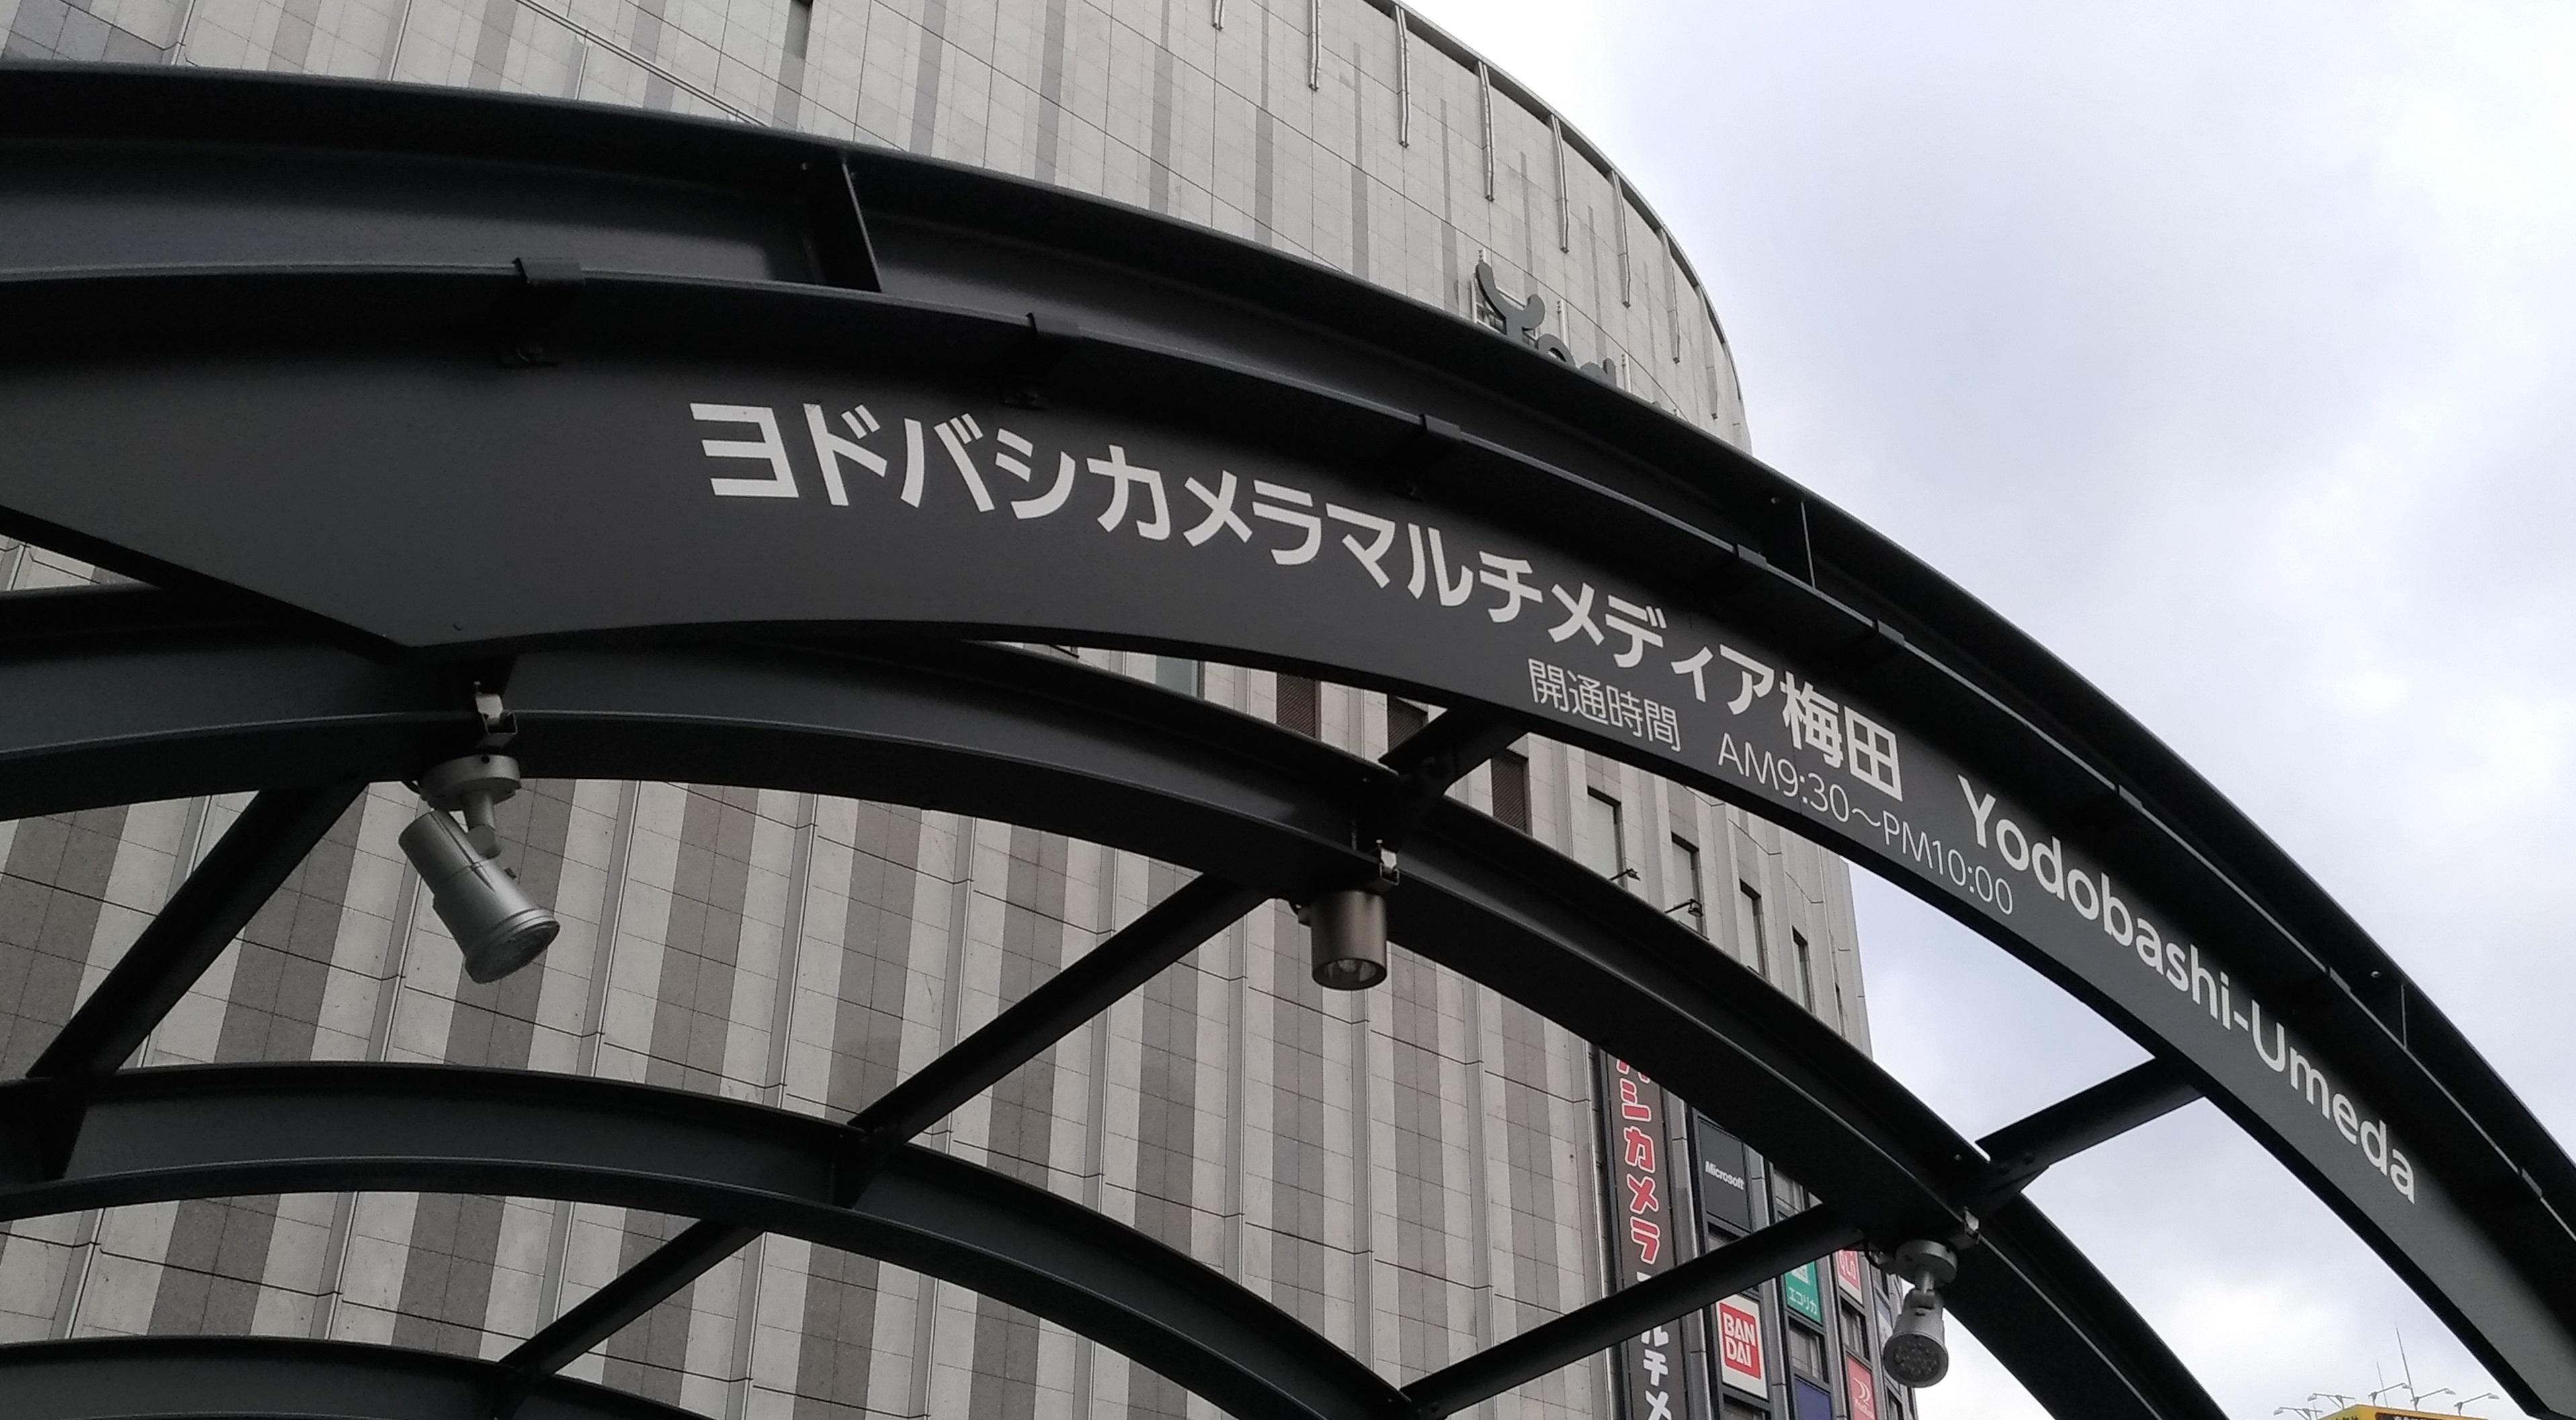 osaka_yodobashi_umeda_223_3.jpg